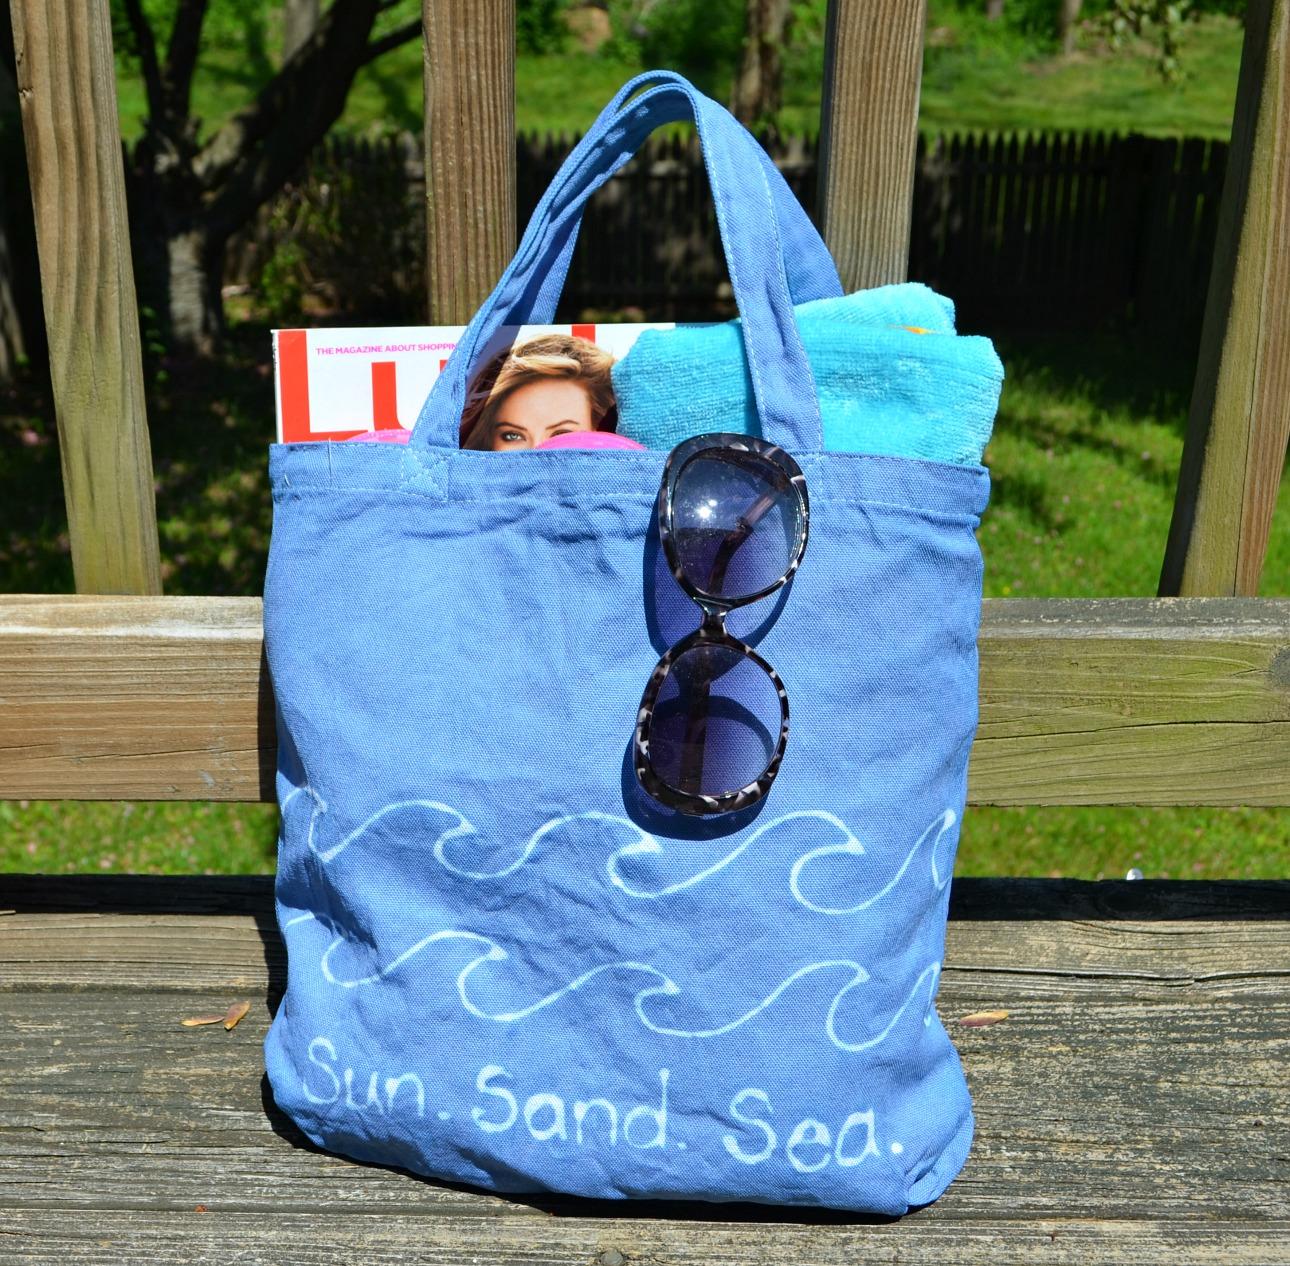 DIY Beach Bag with Dye Resist Technique